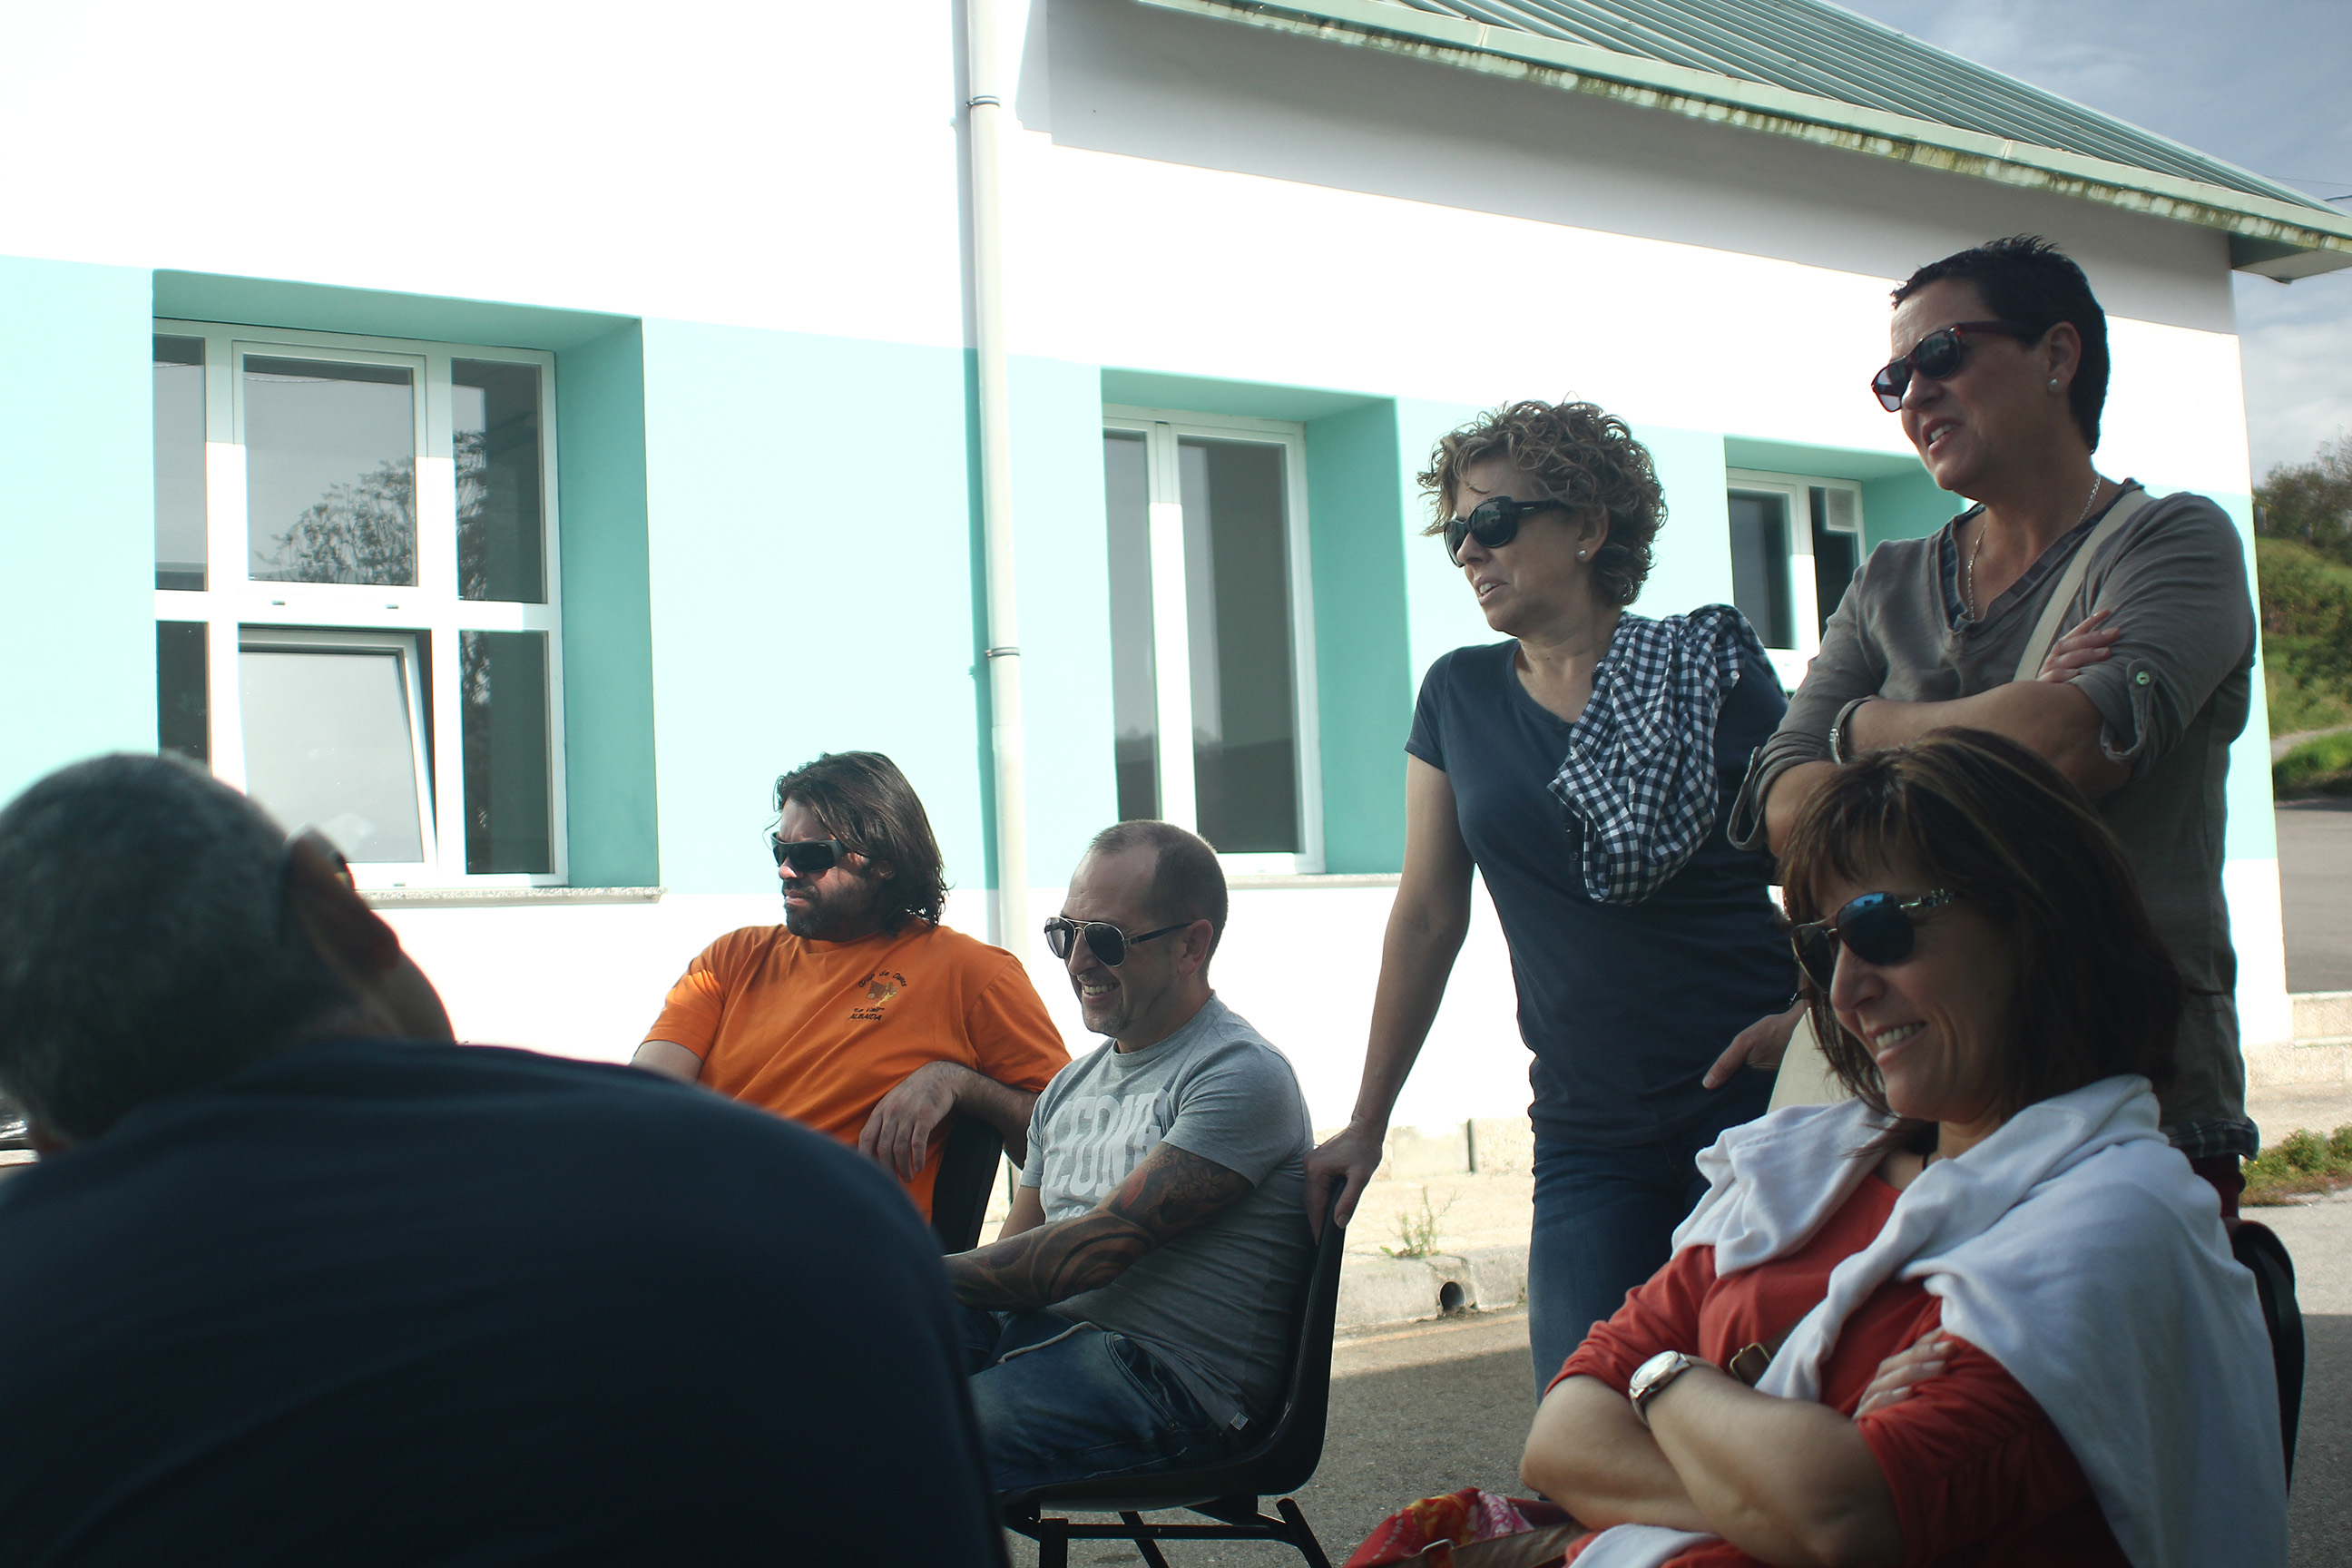 2014-10-25 R.Baladre-Albaida a Asturies Lugones-Moix (43)